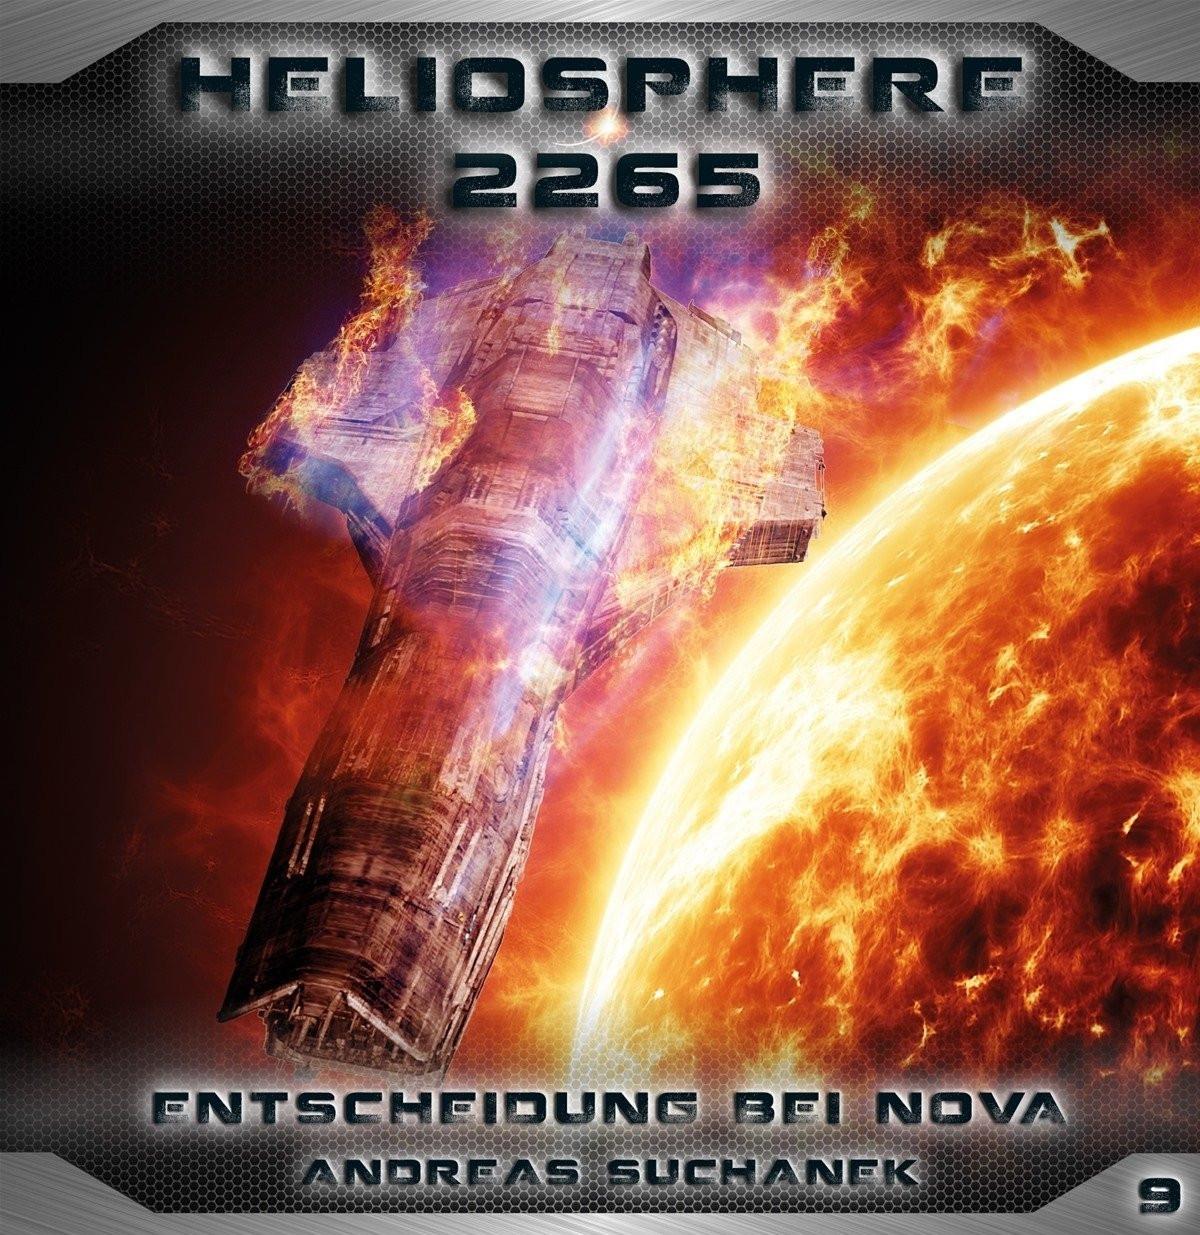 Heliosphere 2265 - Folge 9 : Entscheidung Bei Nova